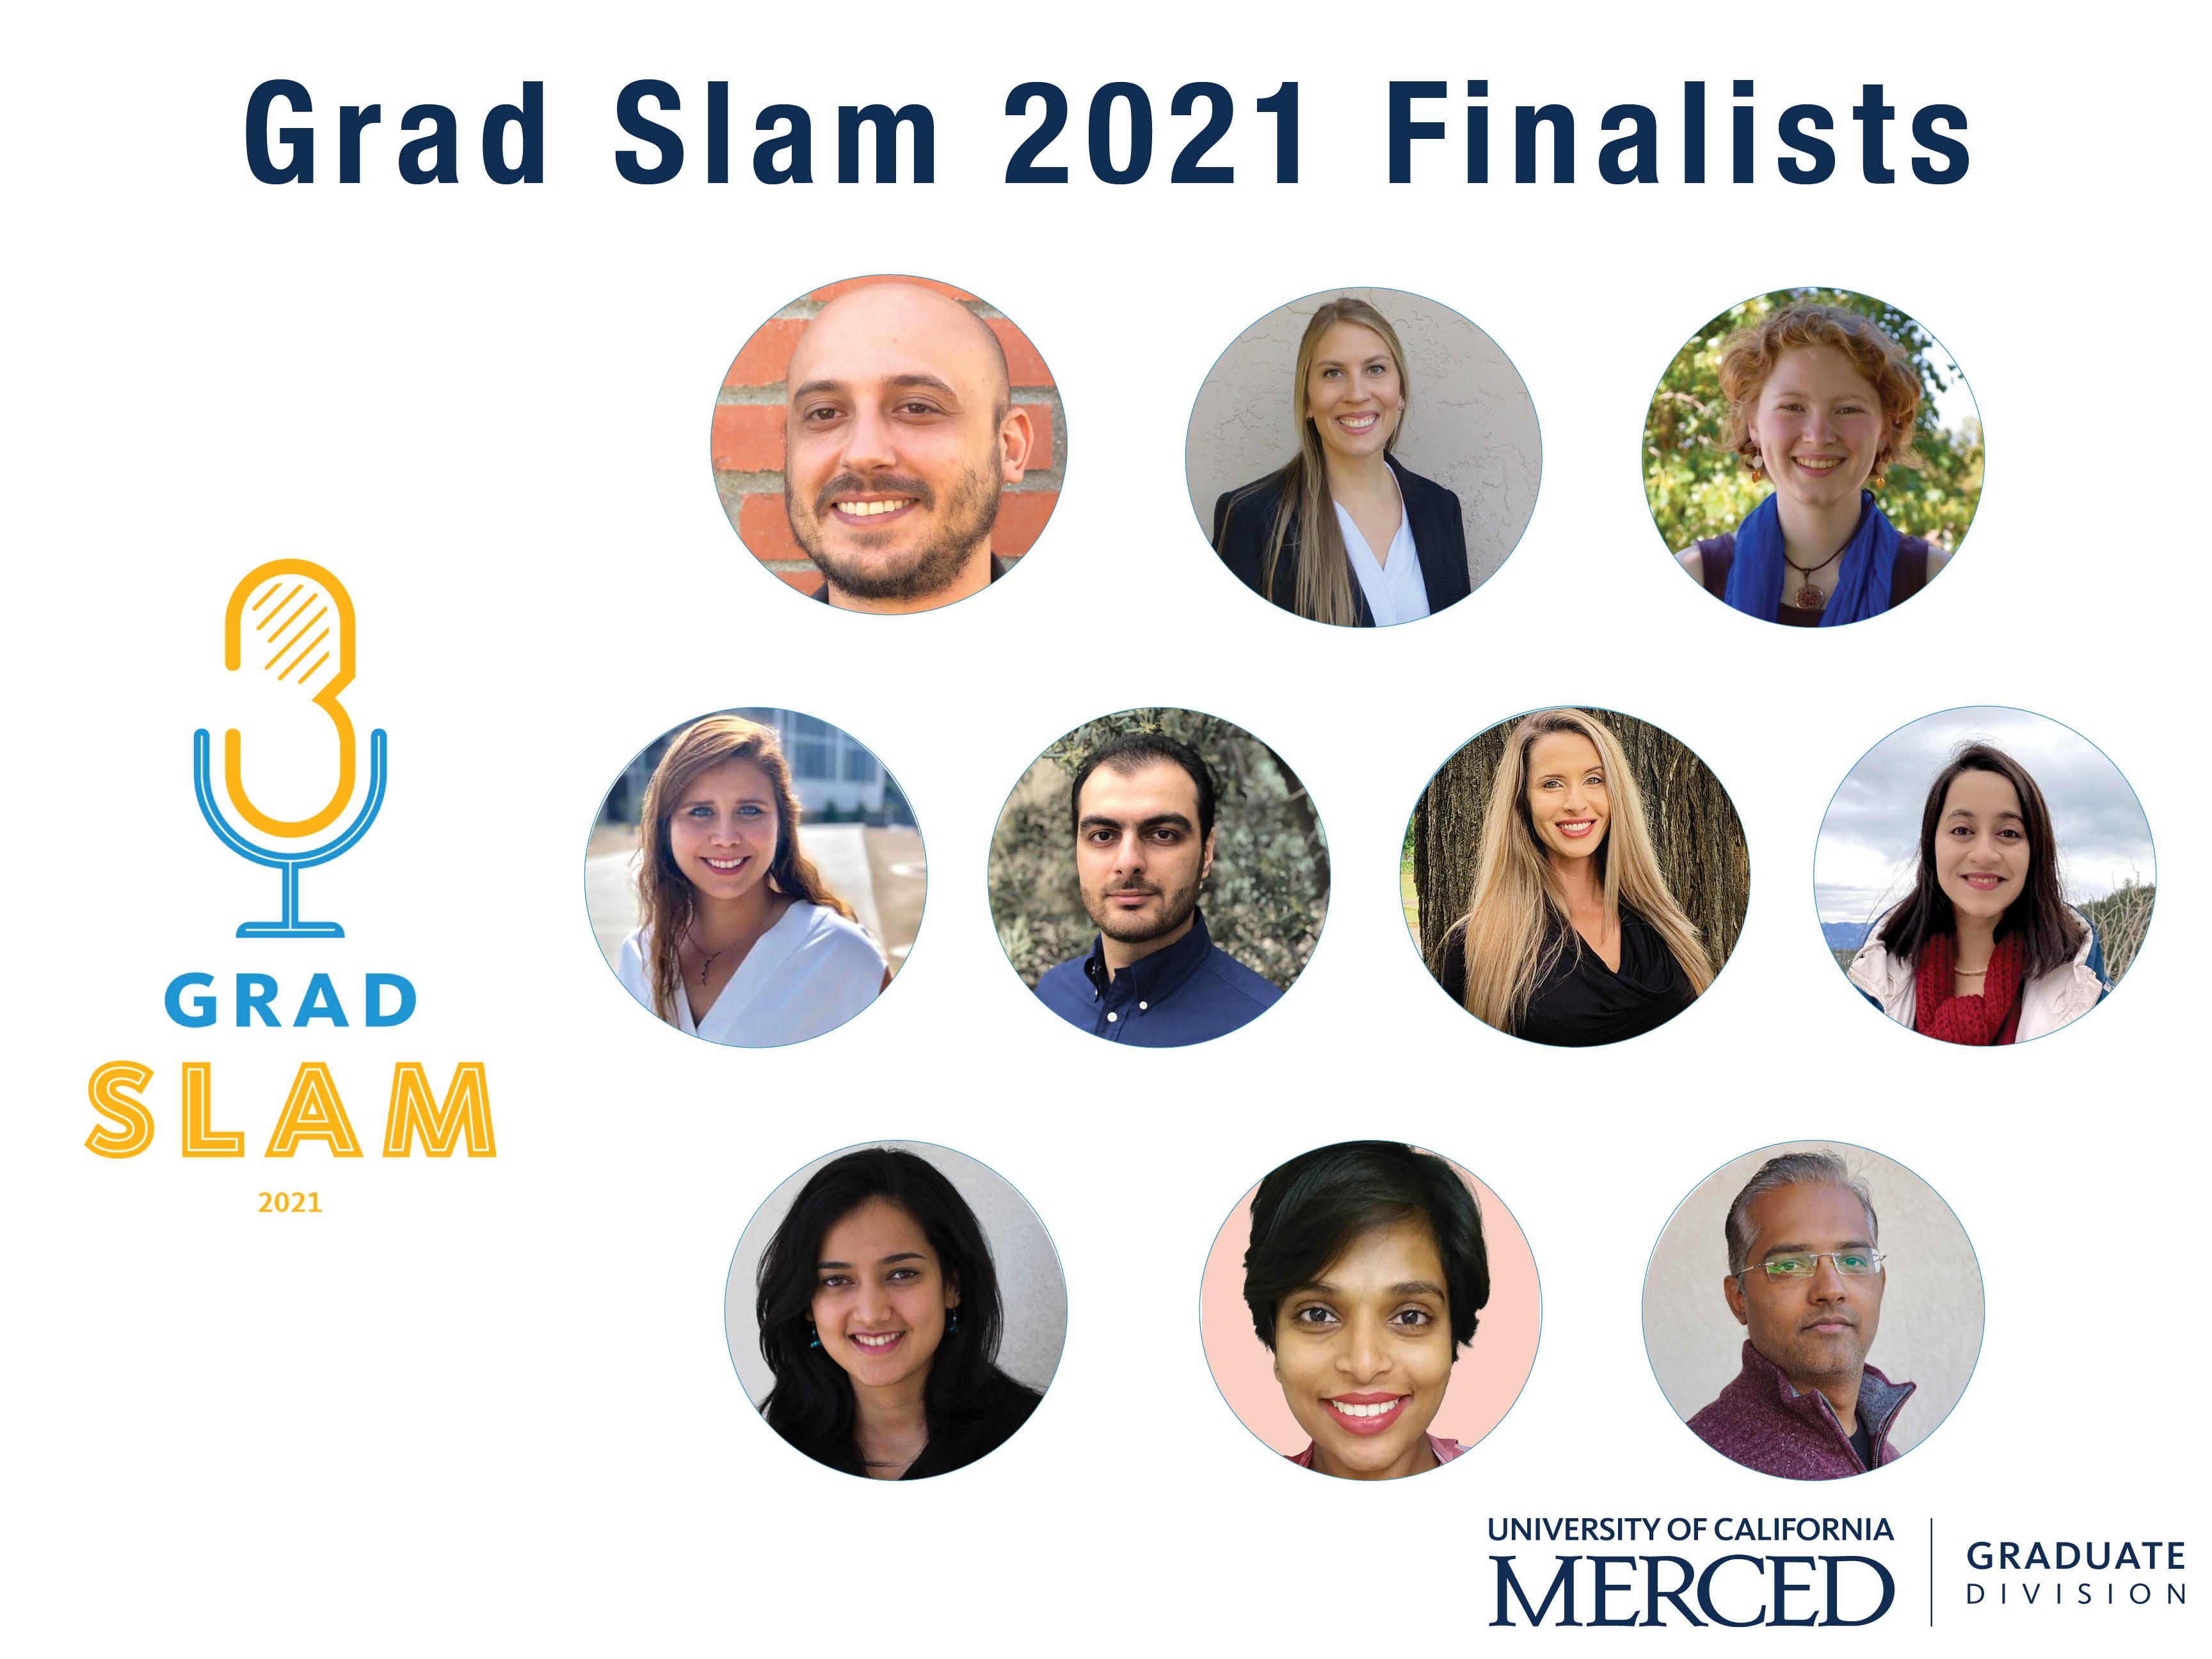 10 graduate student finalists for Grad Slam